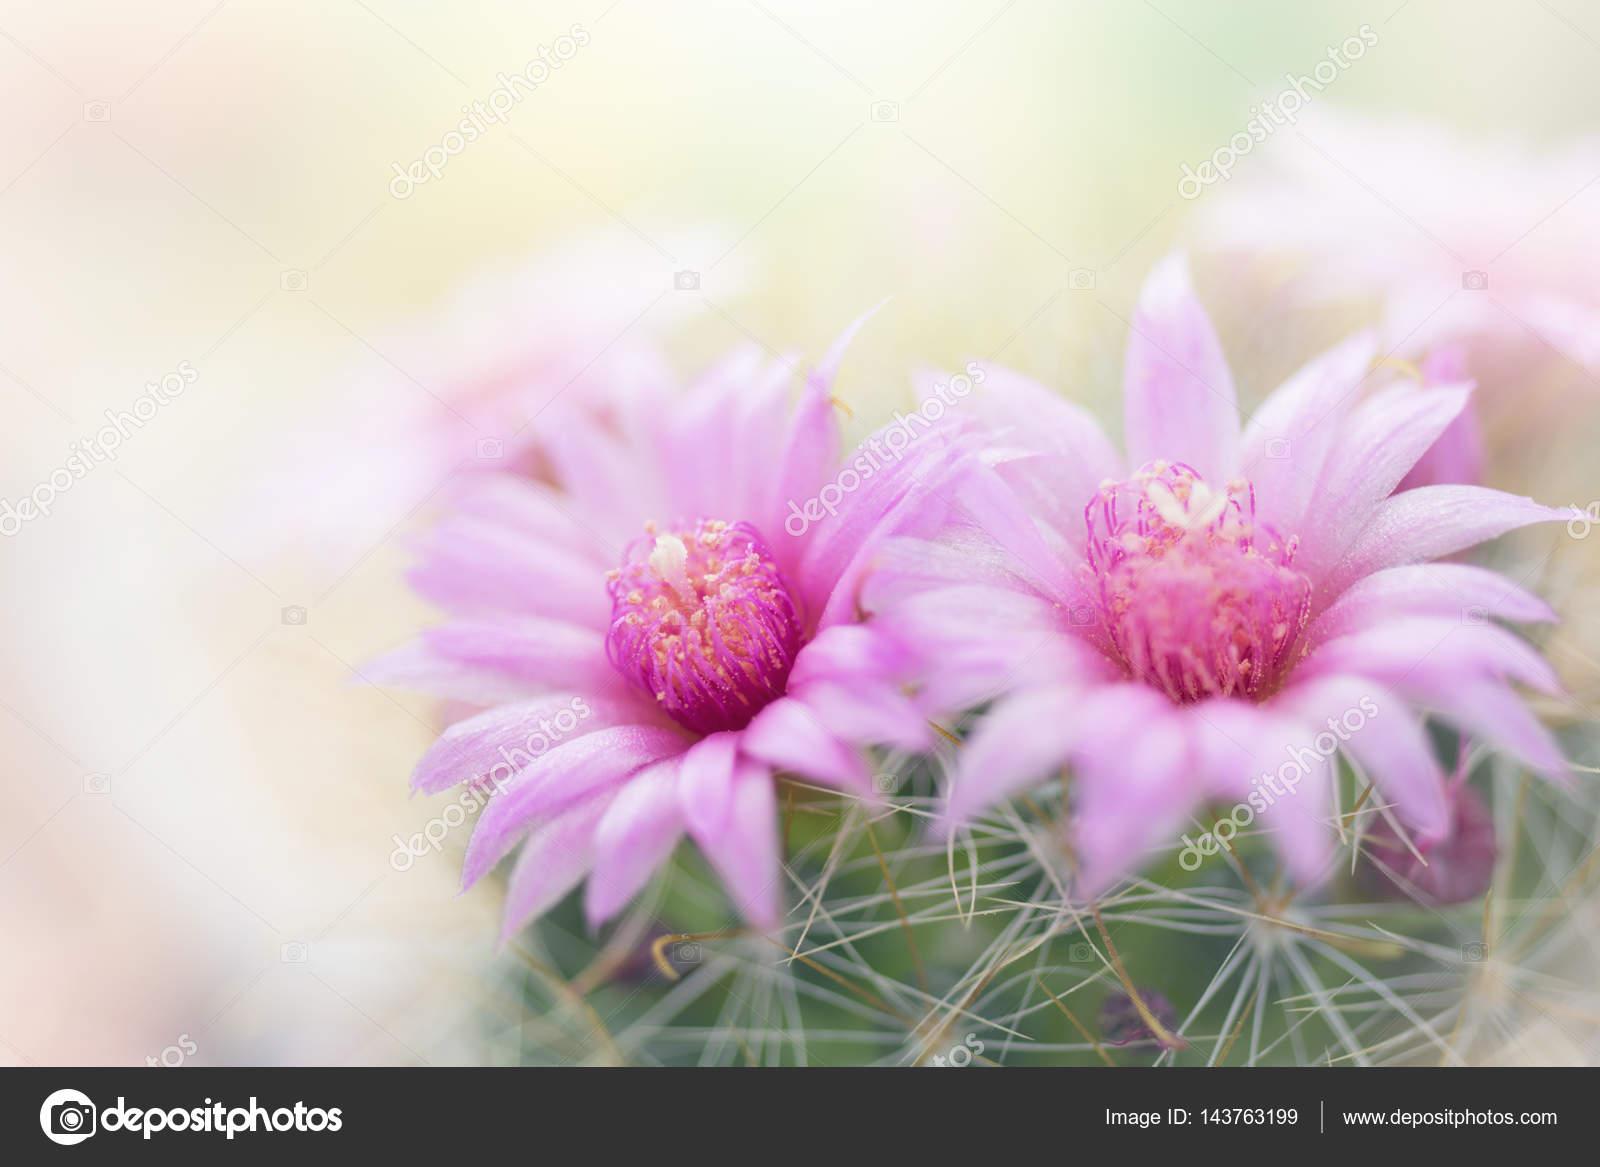 Beautiful Pink Cactus Flower Blooming In Garden Stock Photo